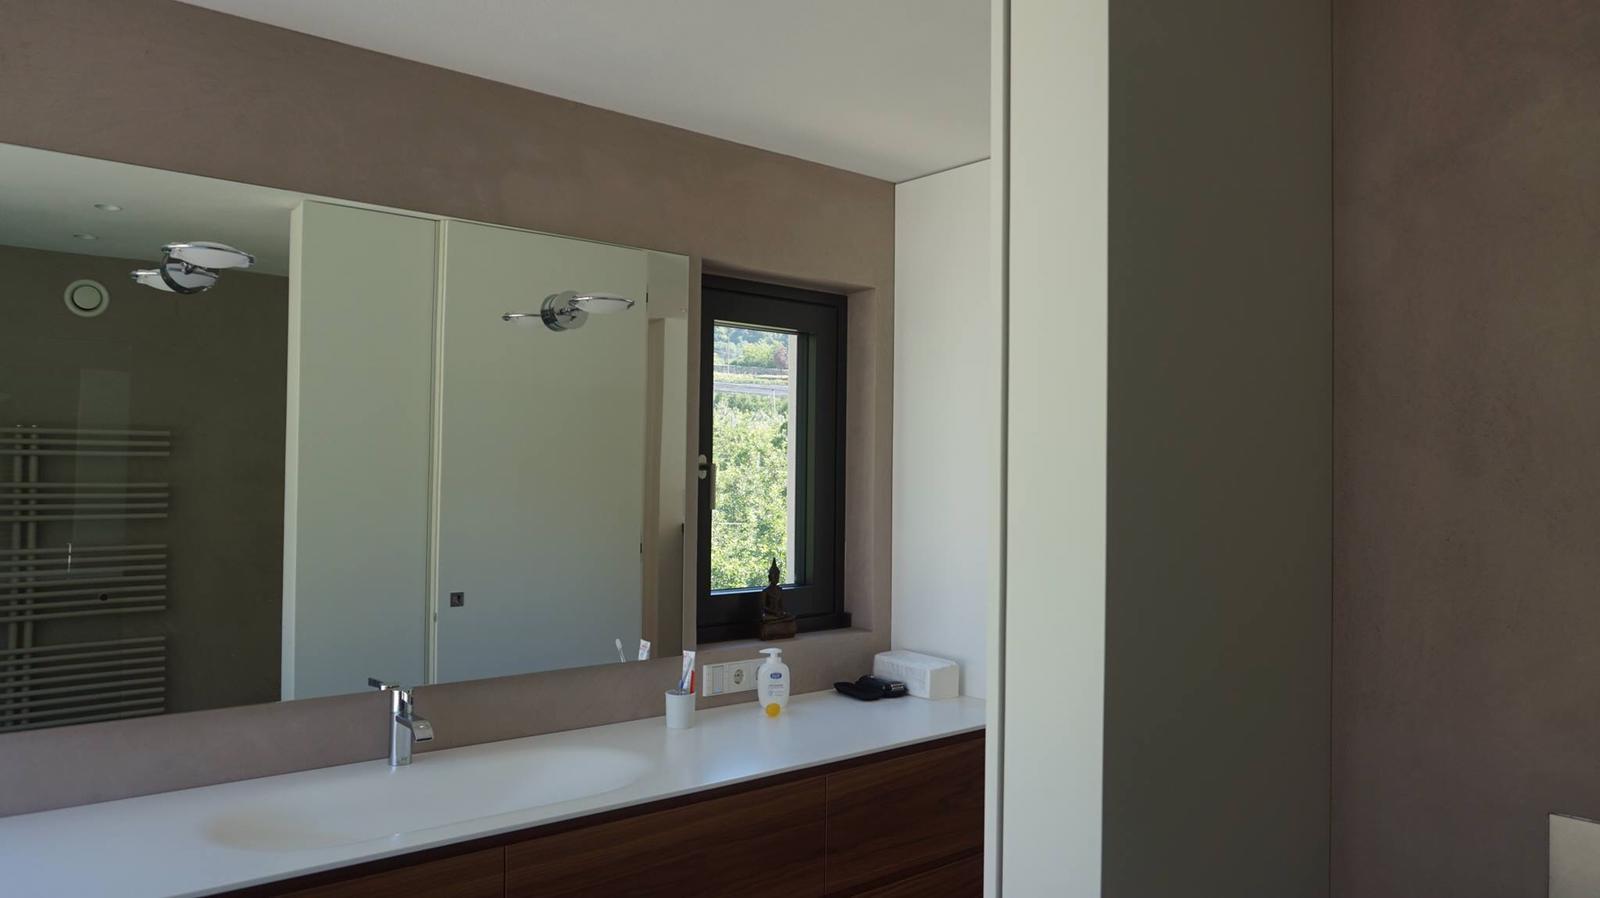 pavimento in resina effetto spatolato velato miroitaly. Black Bedroom Furniture Sets. Home Design Ideas